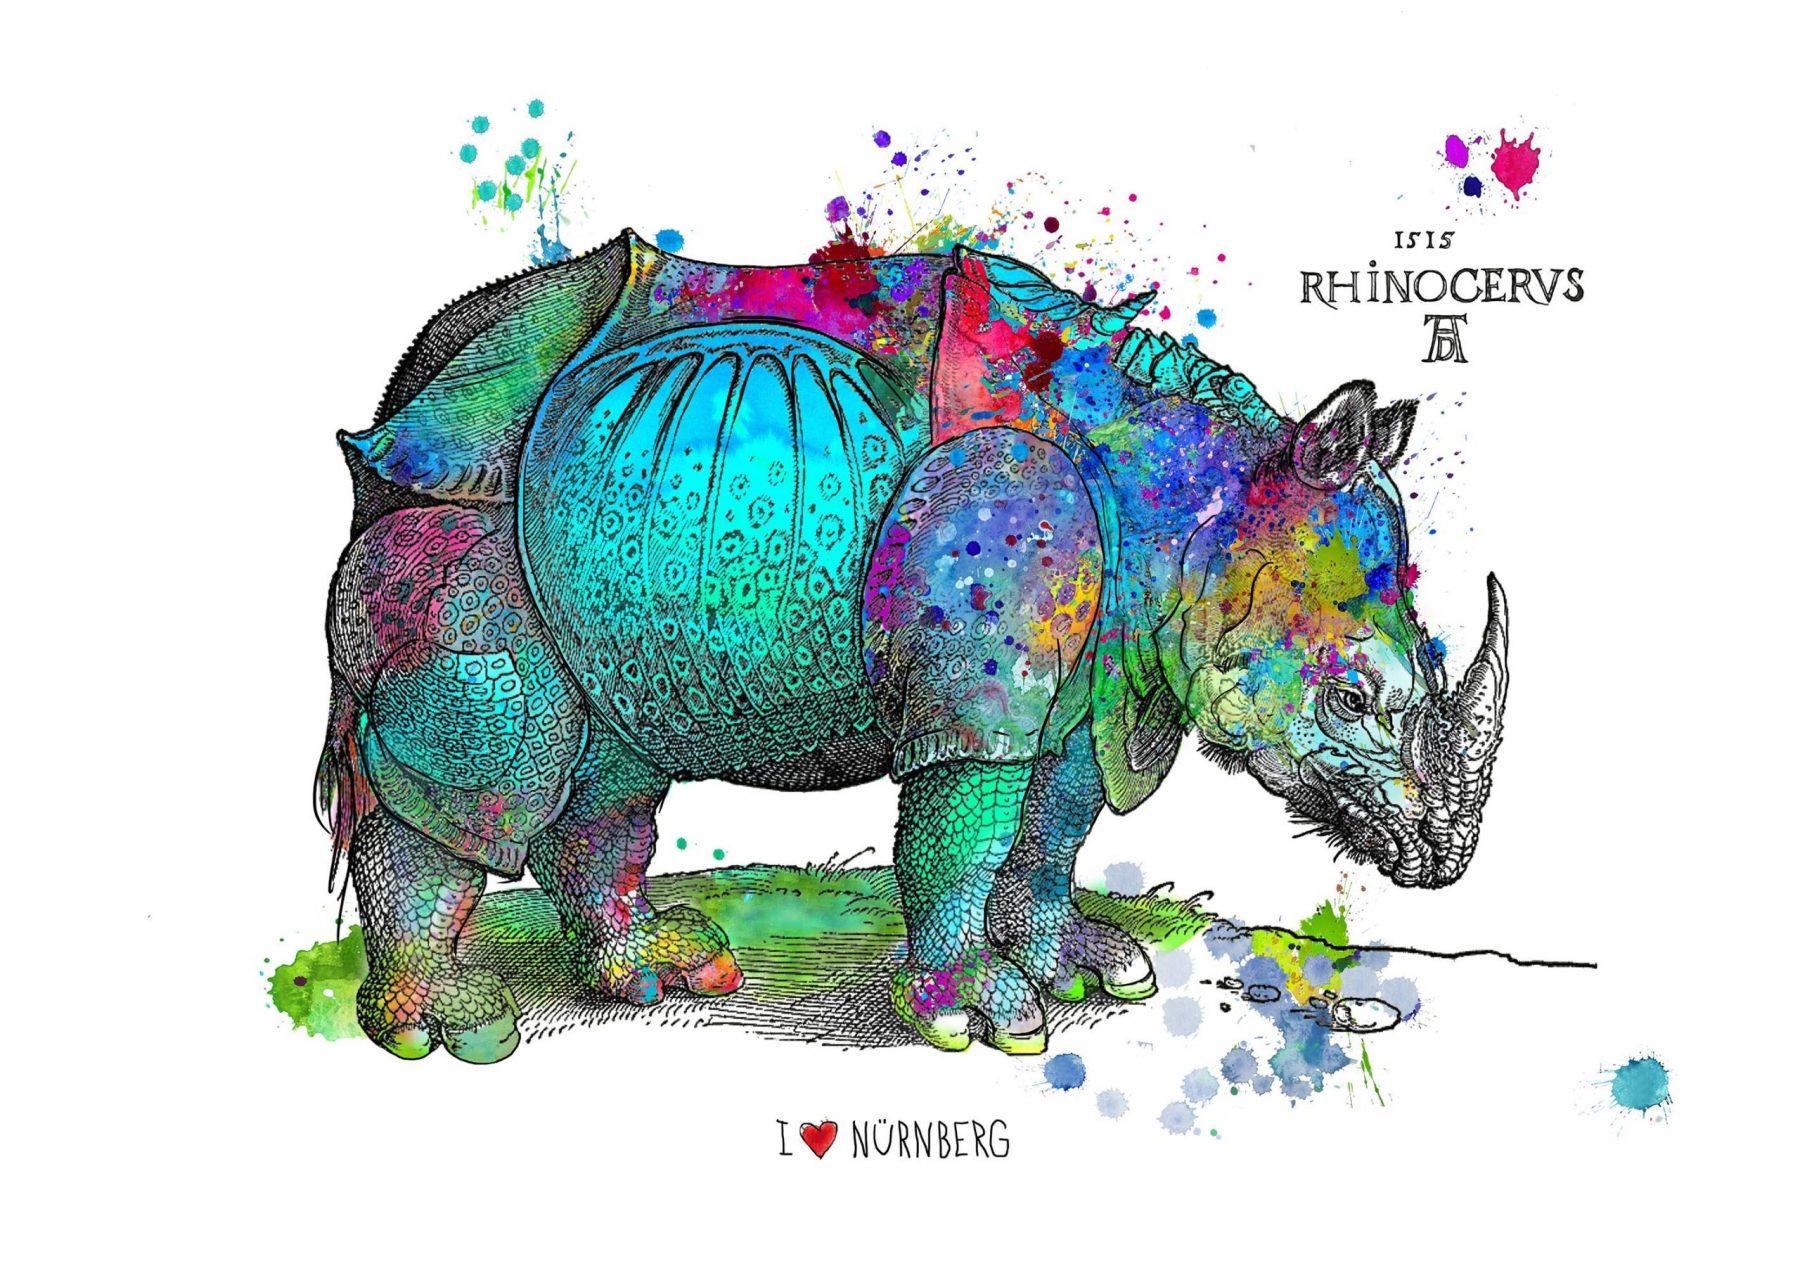 Rhino blau - Osten, Birgit - k-BO01